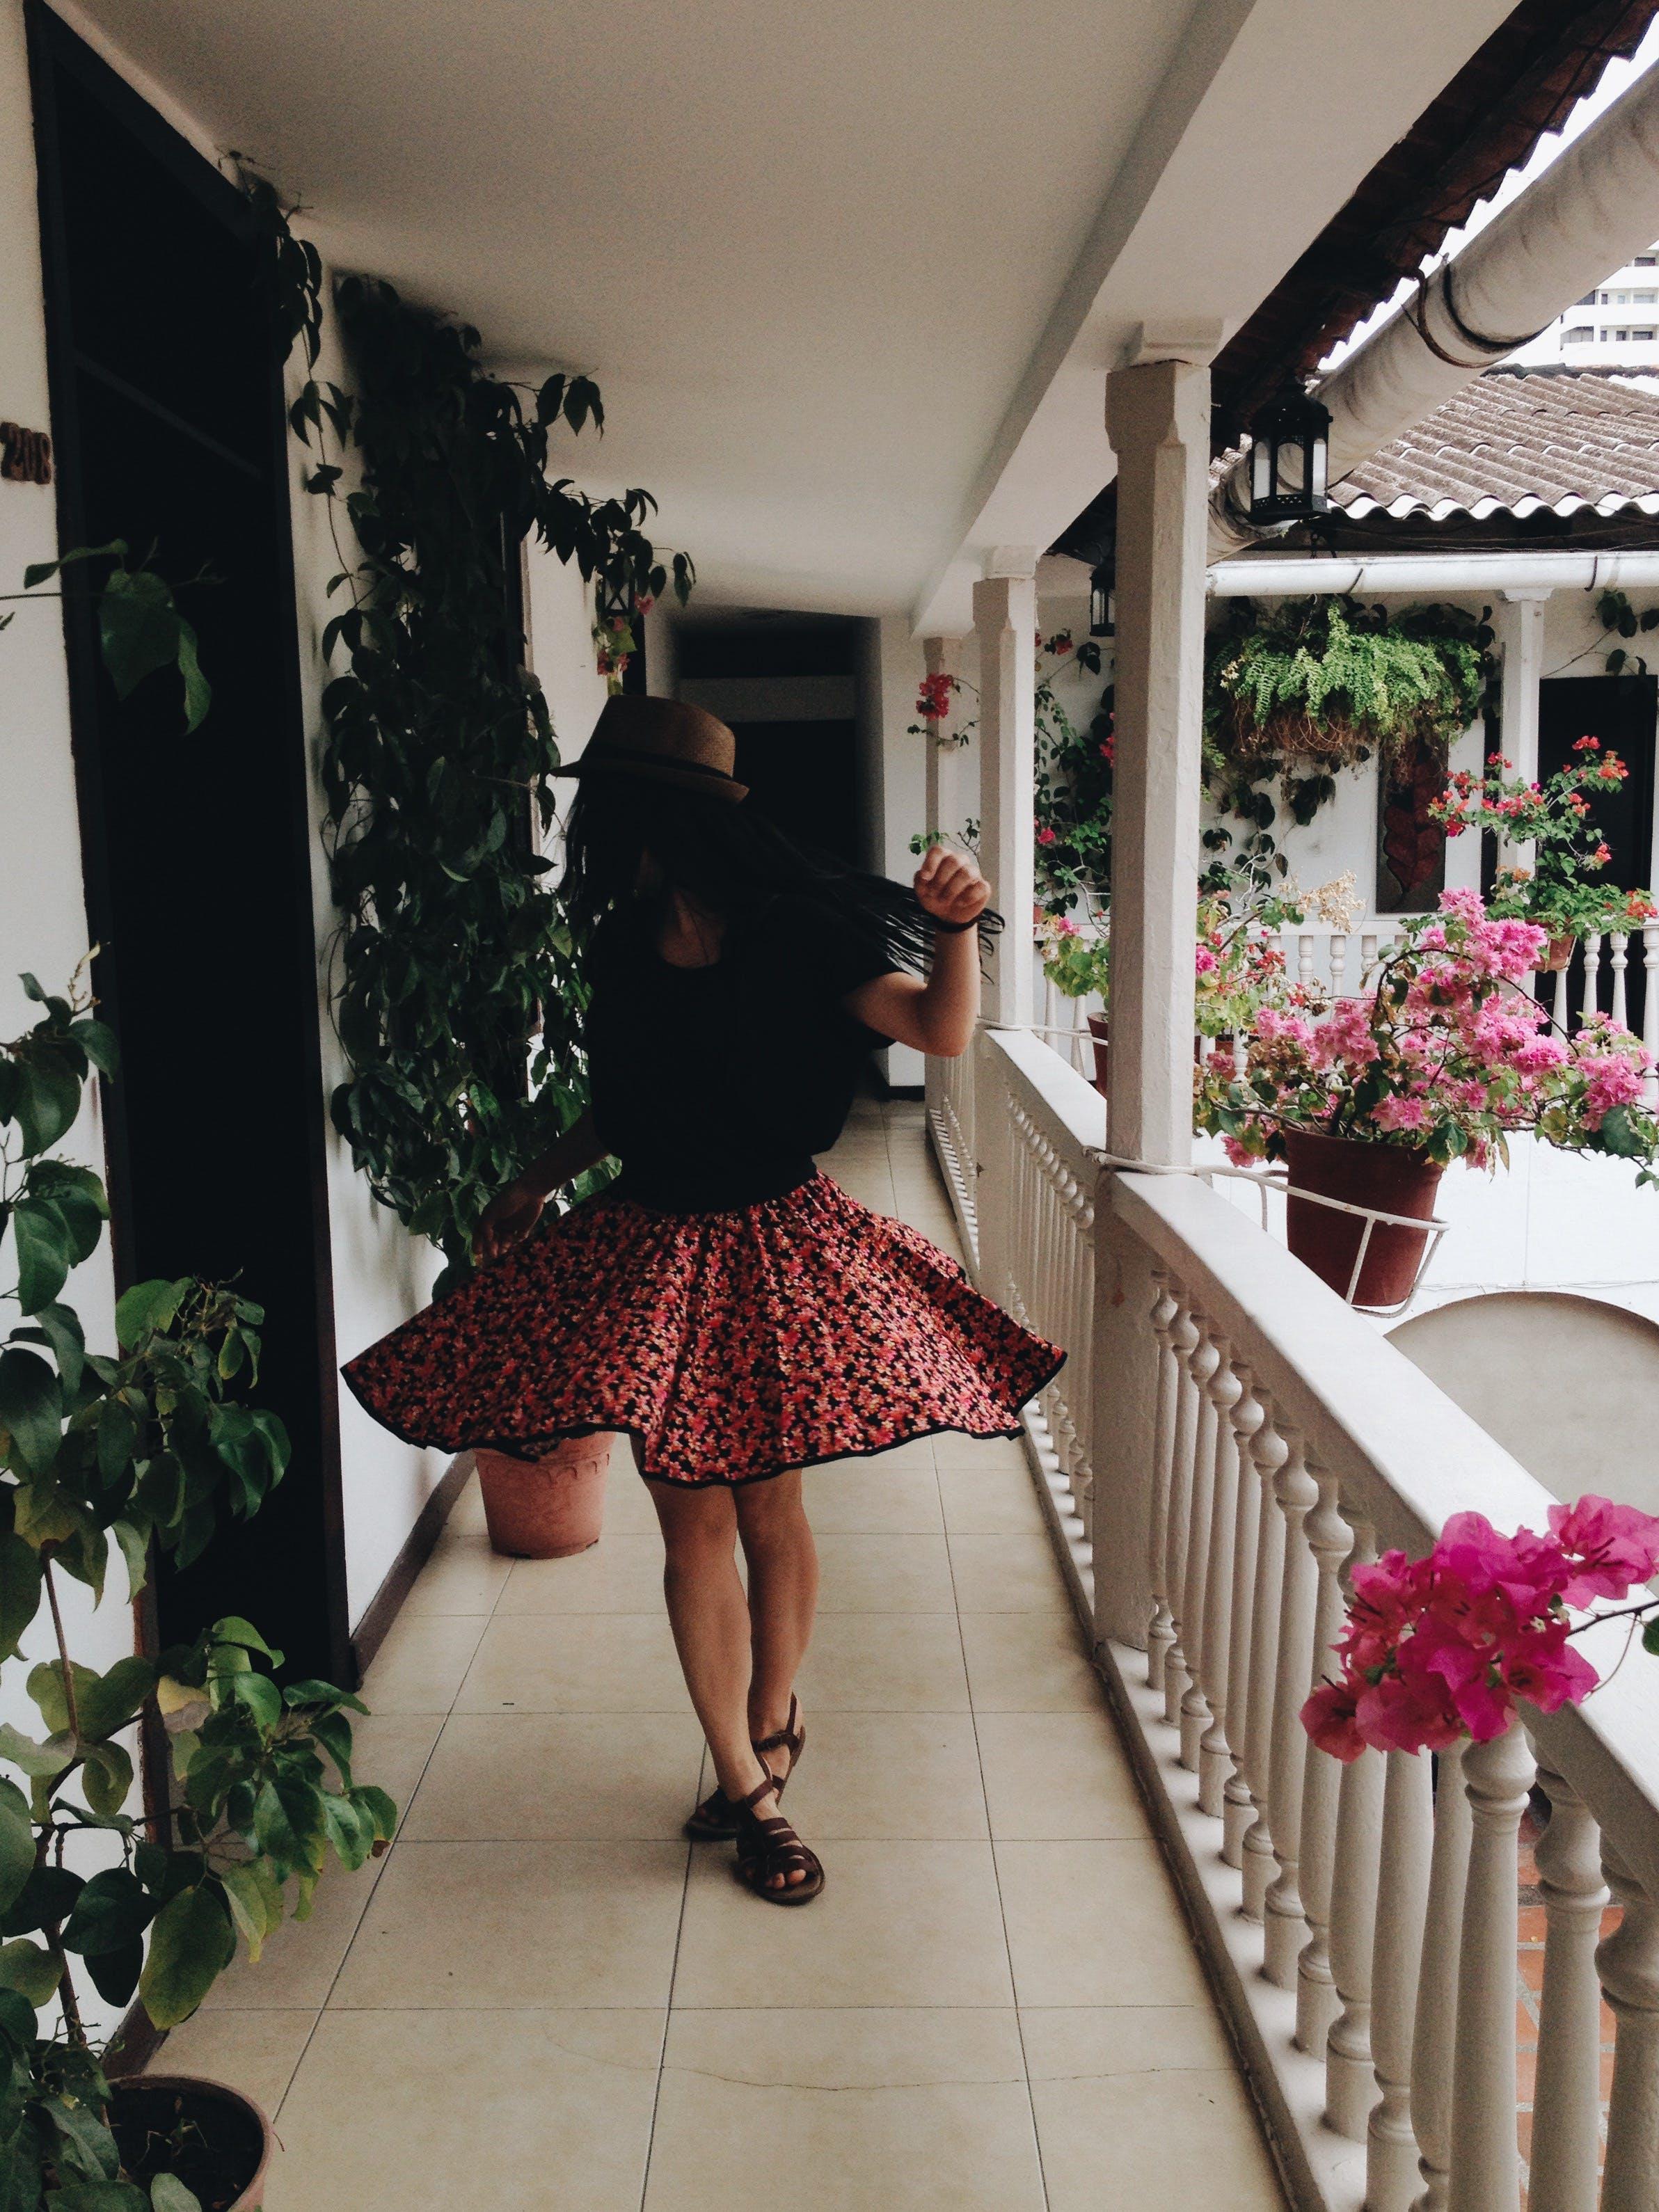 zu blumen, dame, fashion, fotoshooting